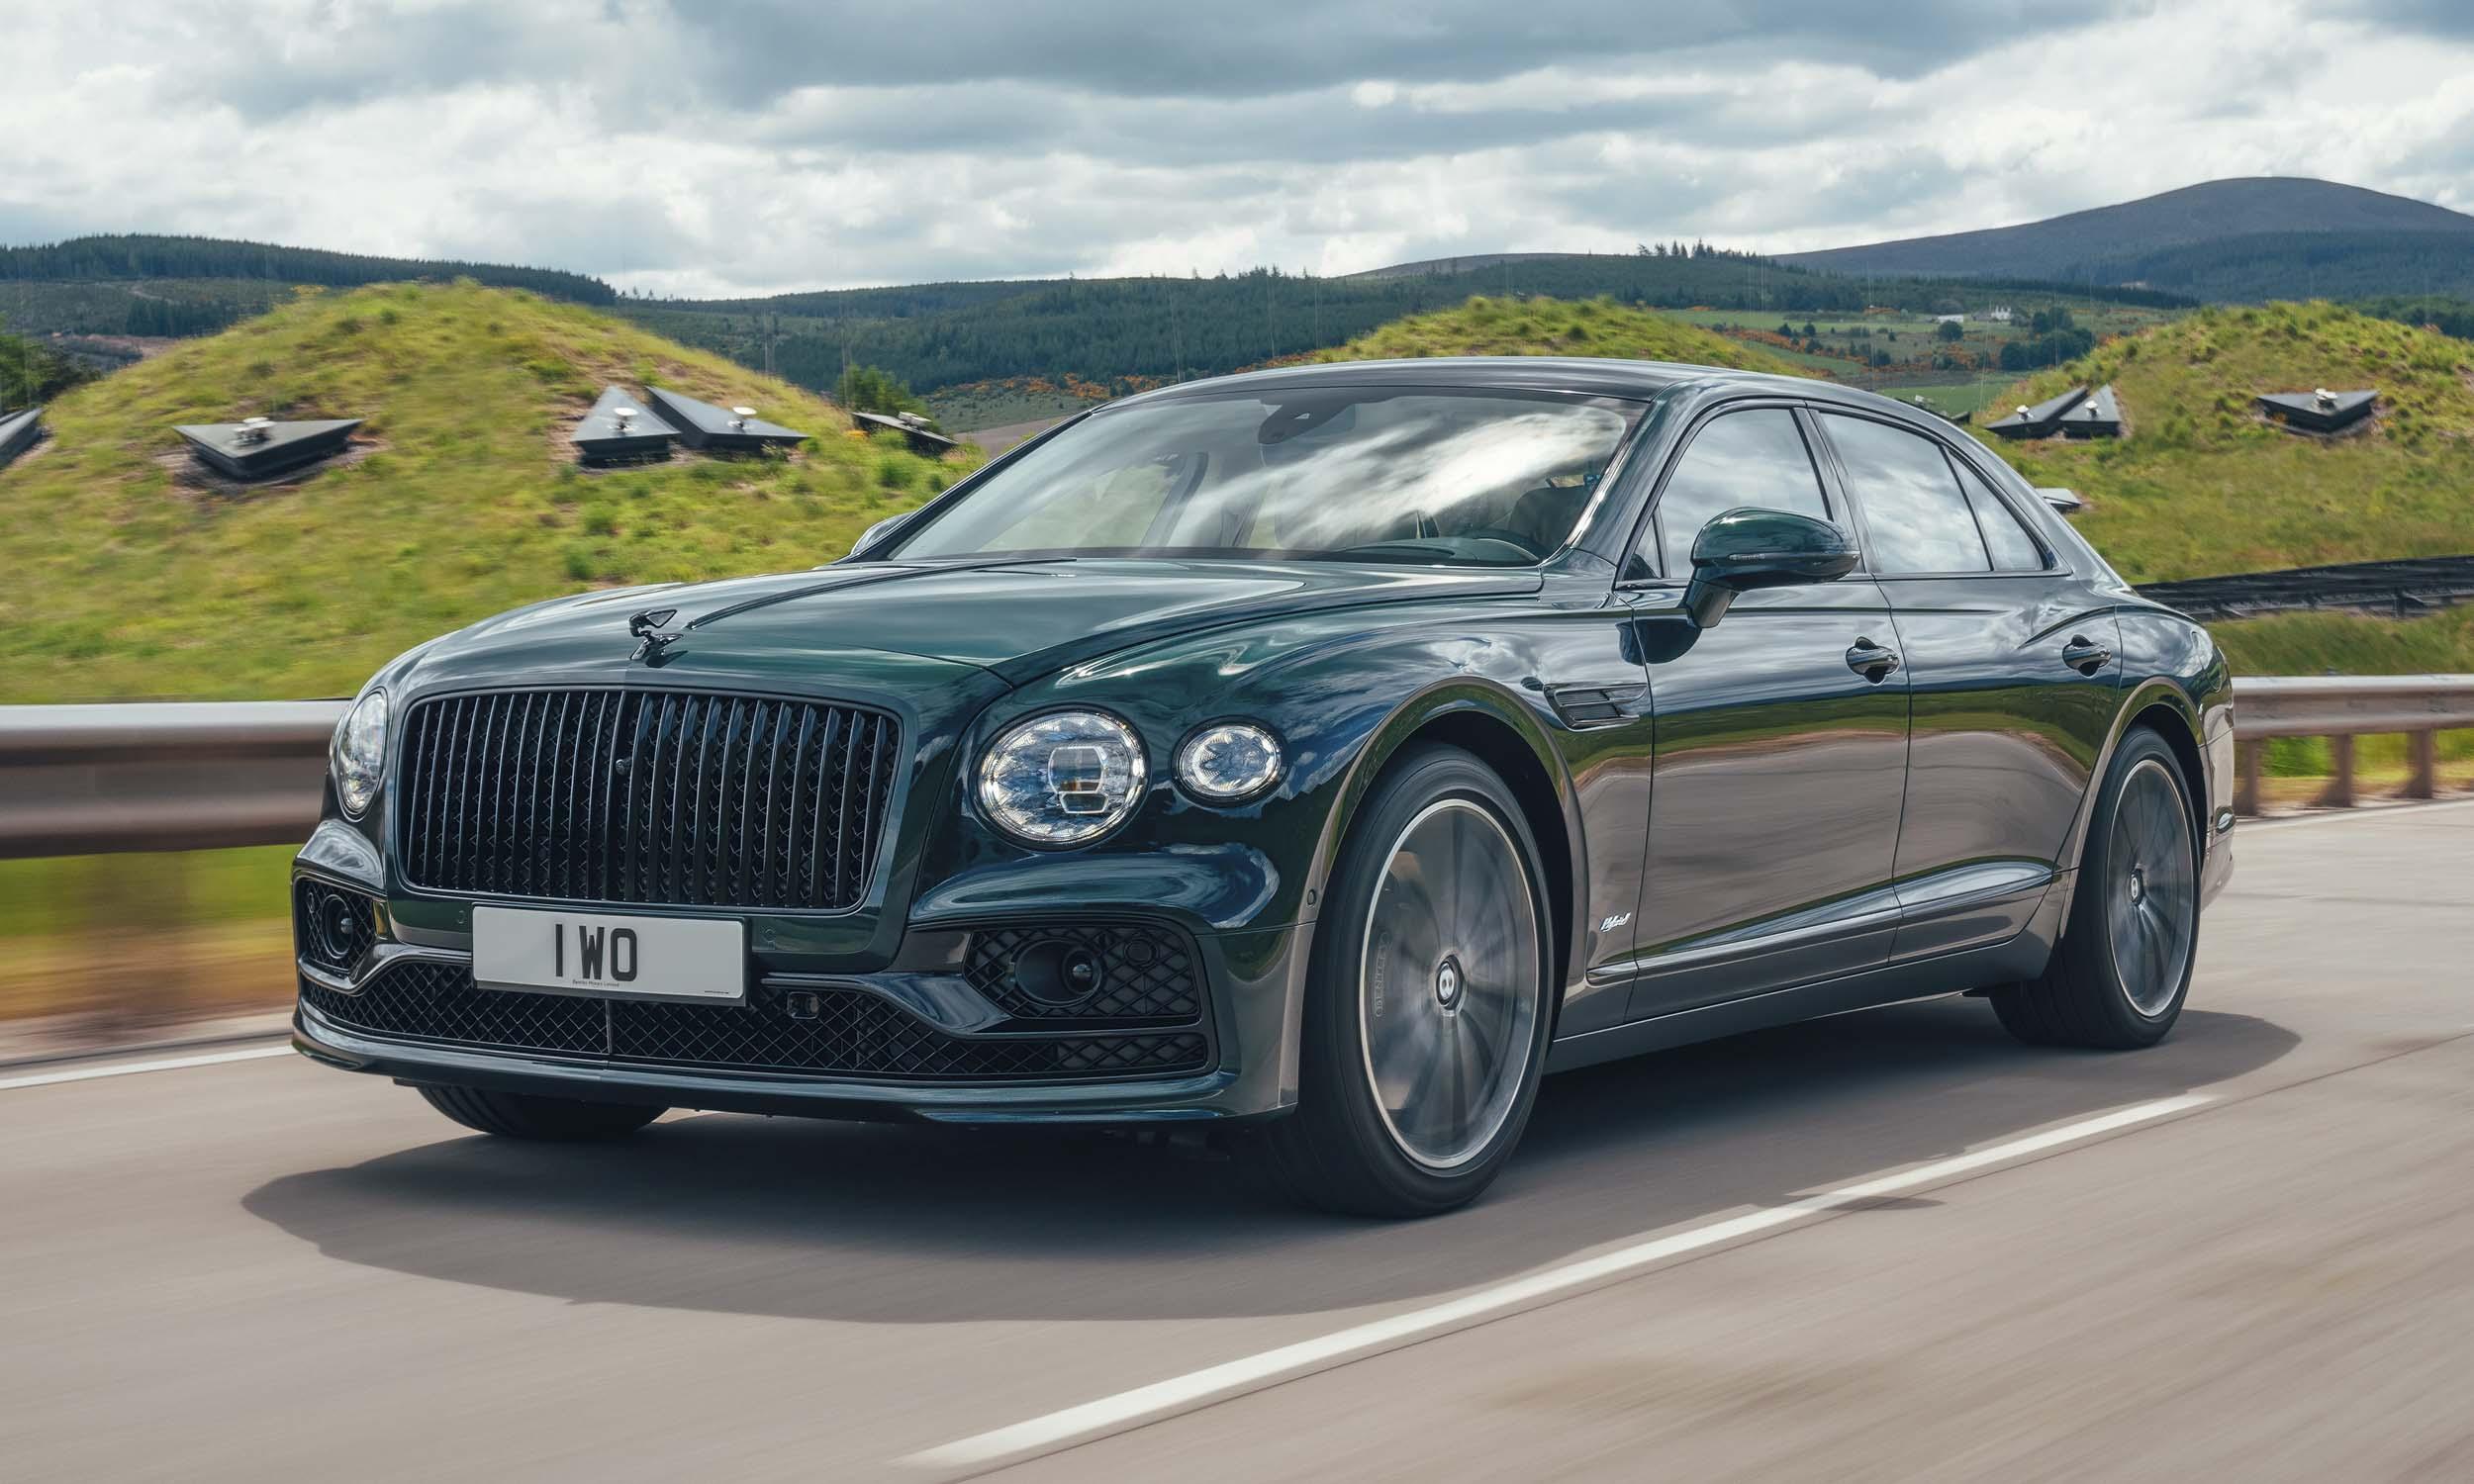 Bentley Flying Spur Hybrid: First Look